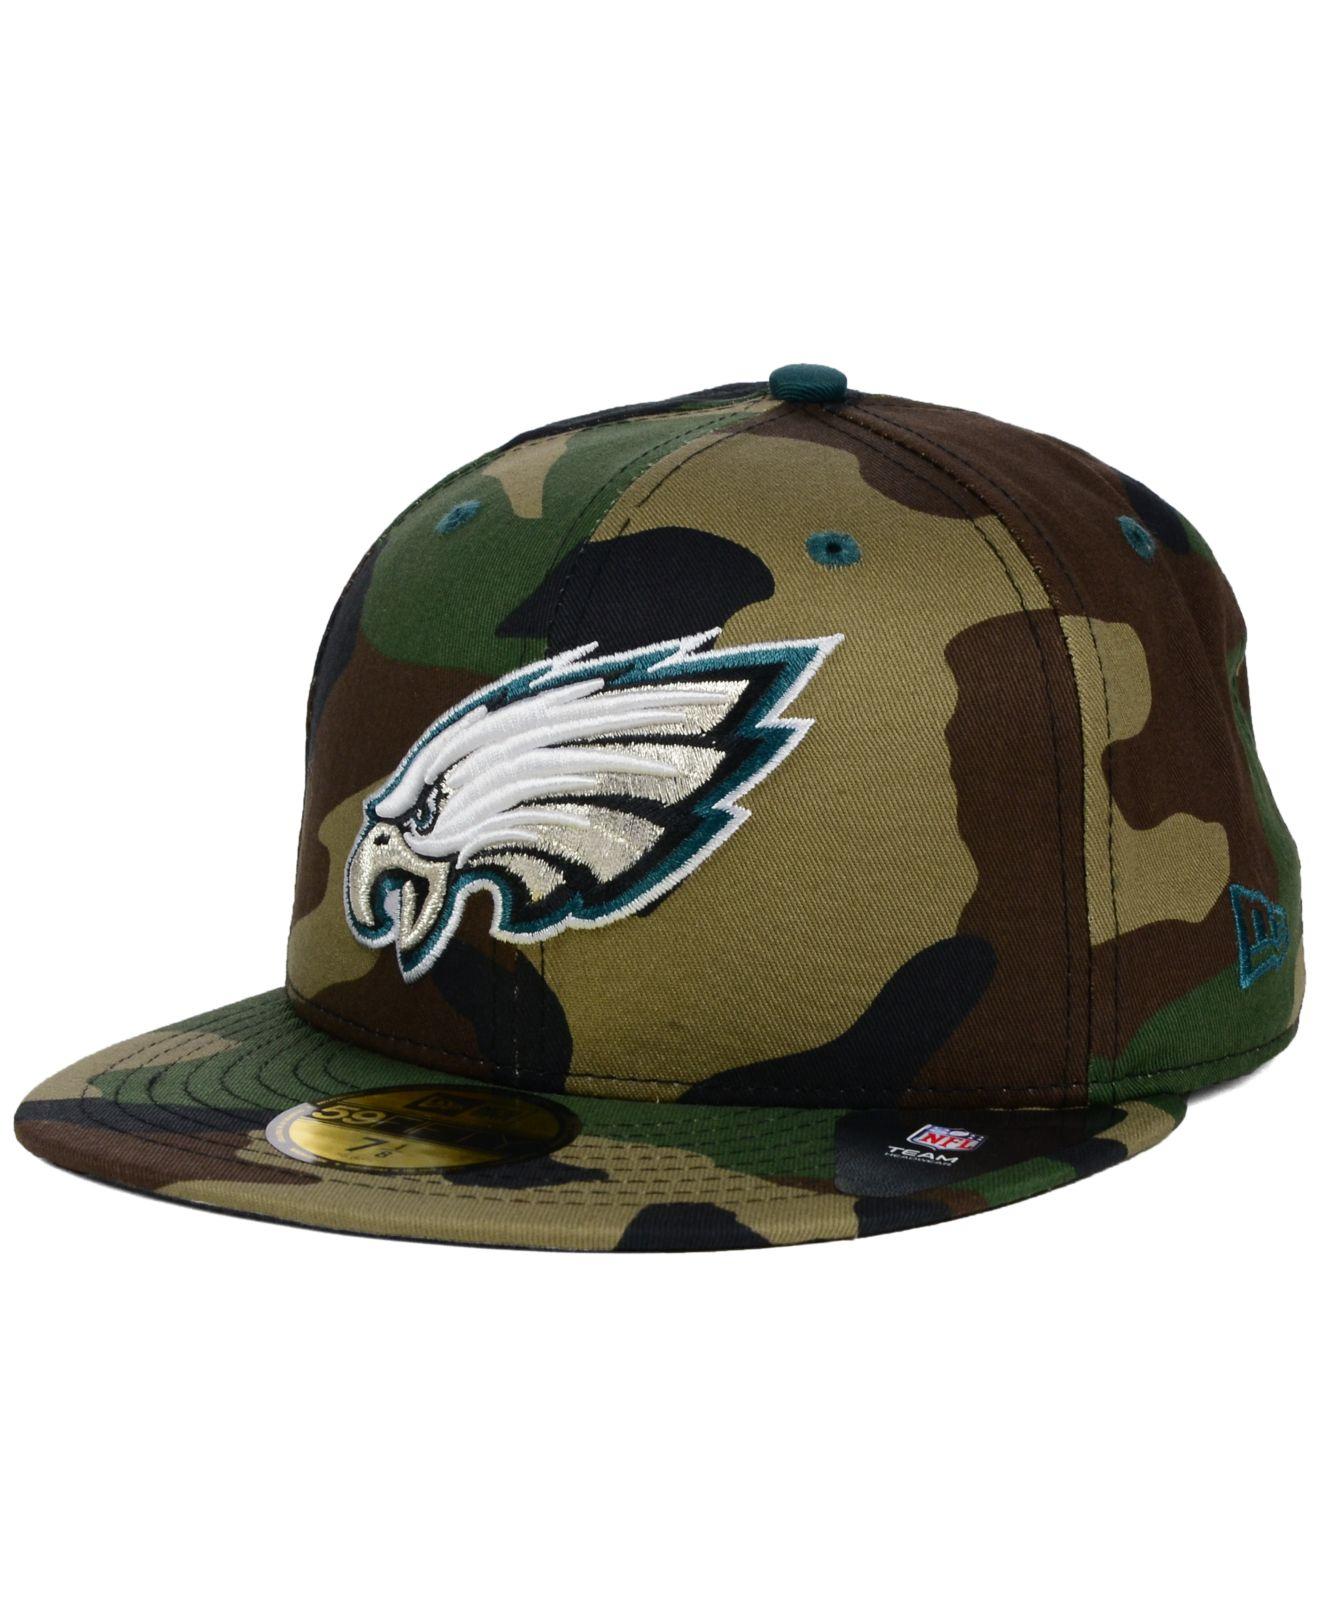 4b28d674622 Lyst - KTZ Philadelphia Eagles Camo Pop 59fifty Cap in Green for Men